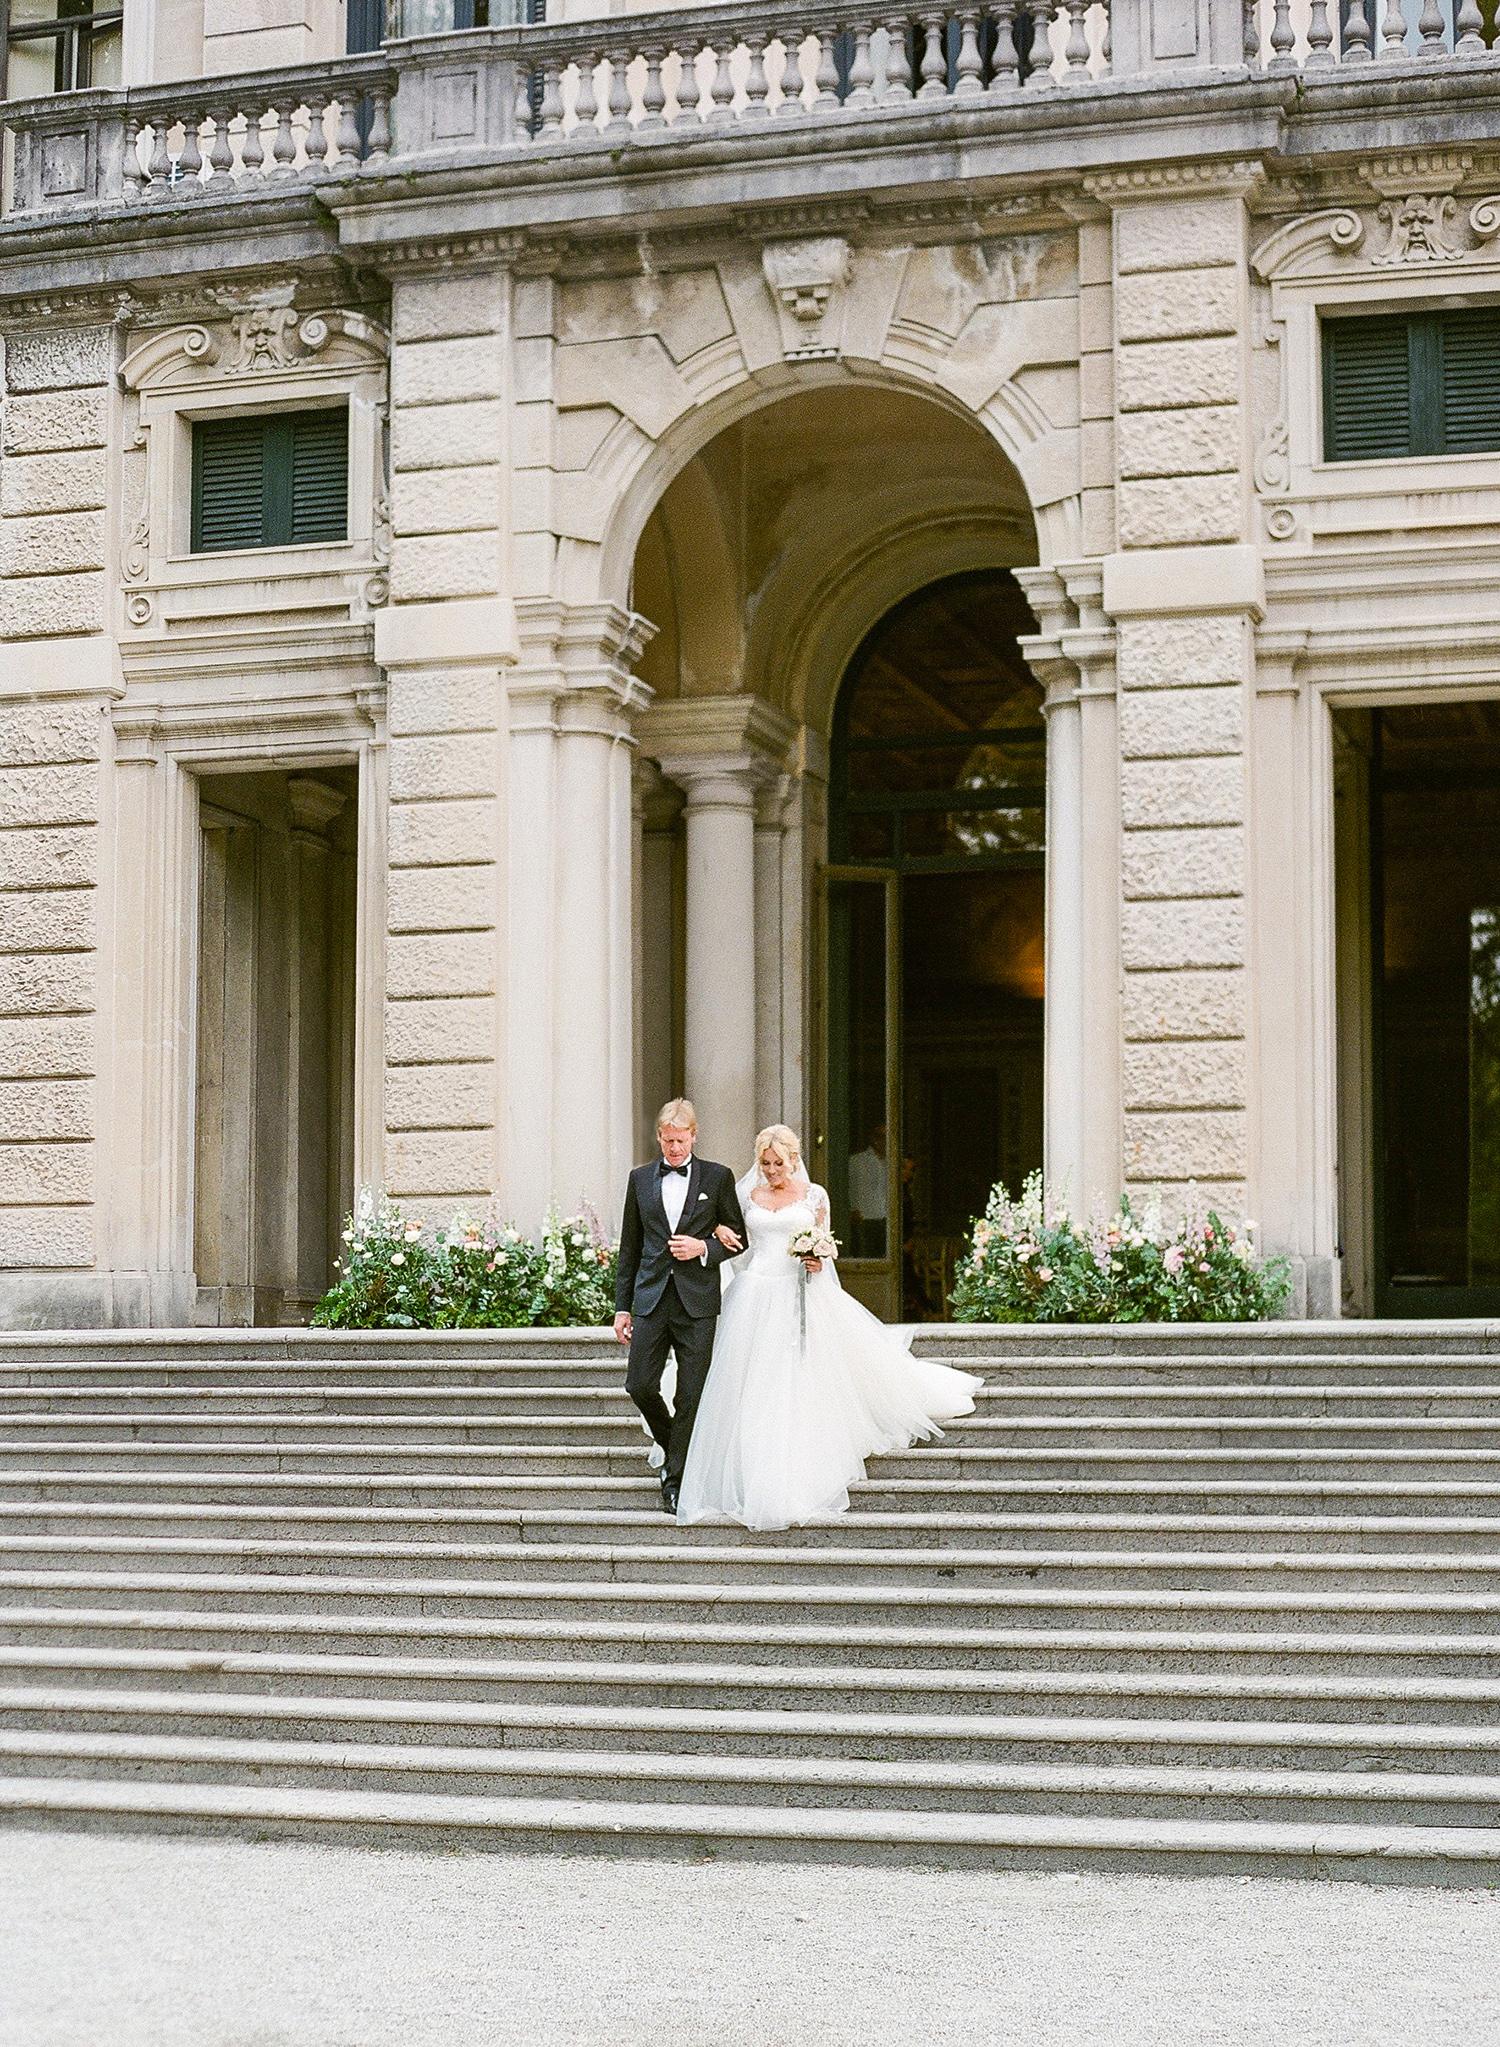 julia mauro wedding processional down steps